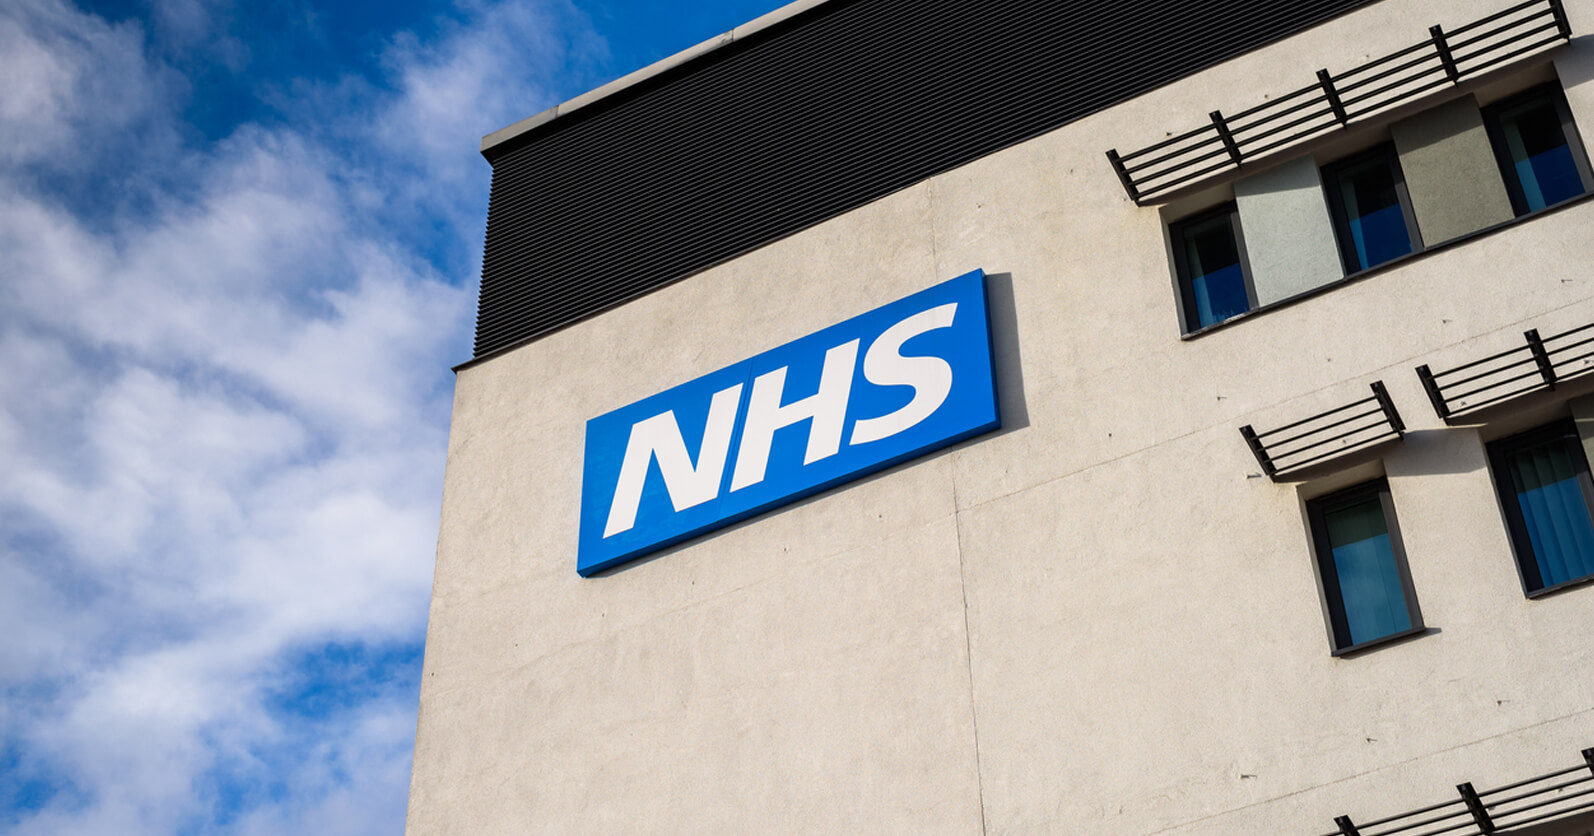 NHS British Healthcare System